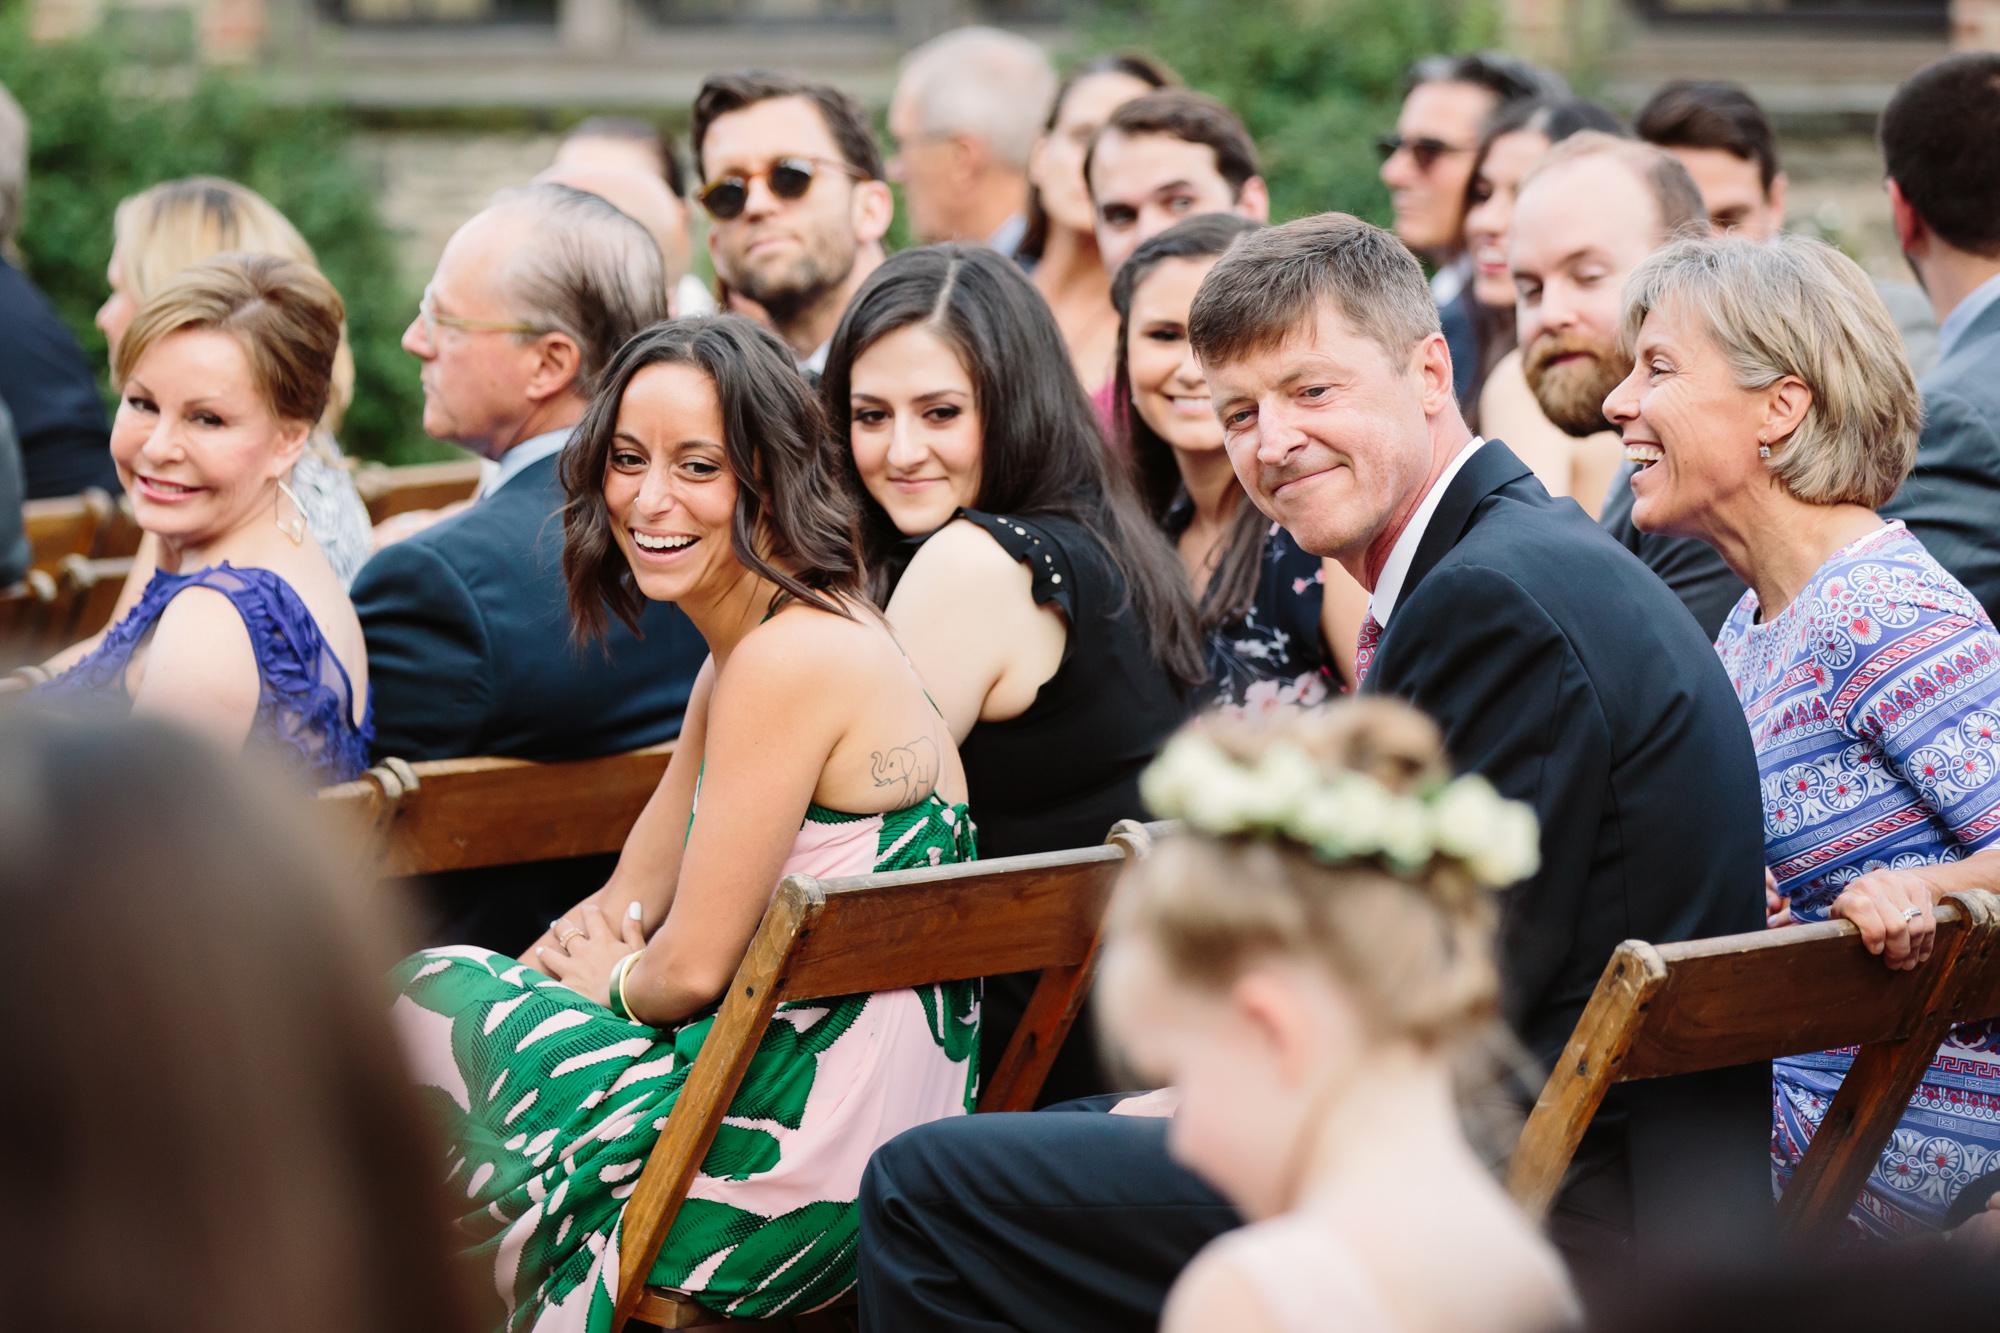 38_Jessica_Ted_Blue_Hill_Stone_Barns_Wedding_Pocantico_NY_Tanya_Salazar_Photography_116.jpg